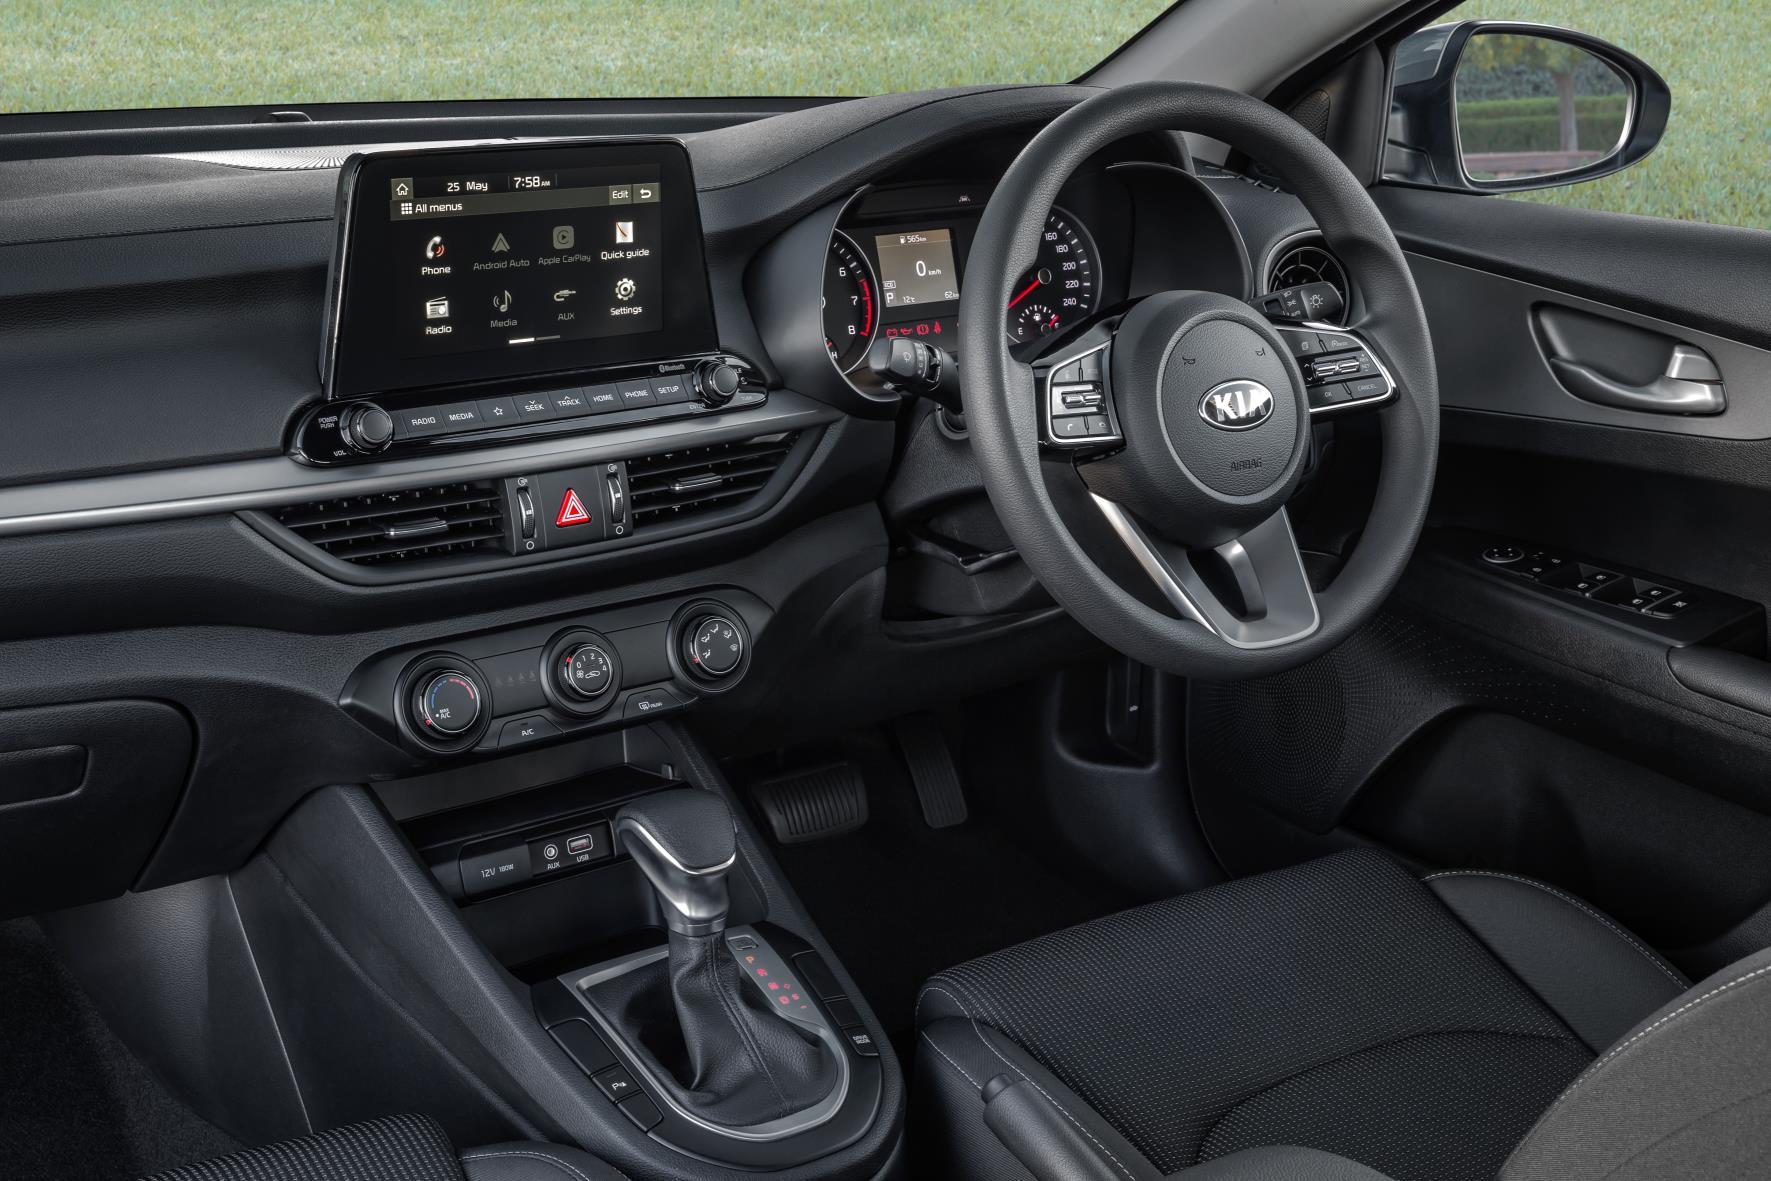 2019 Kia Cerato now on sale in Australia from $19,990 | PerformanceDrive